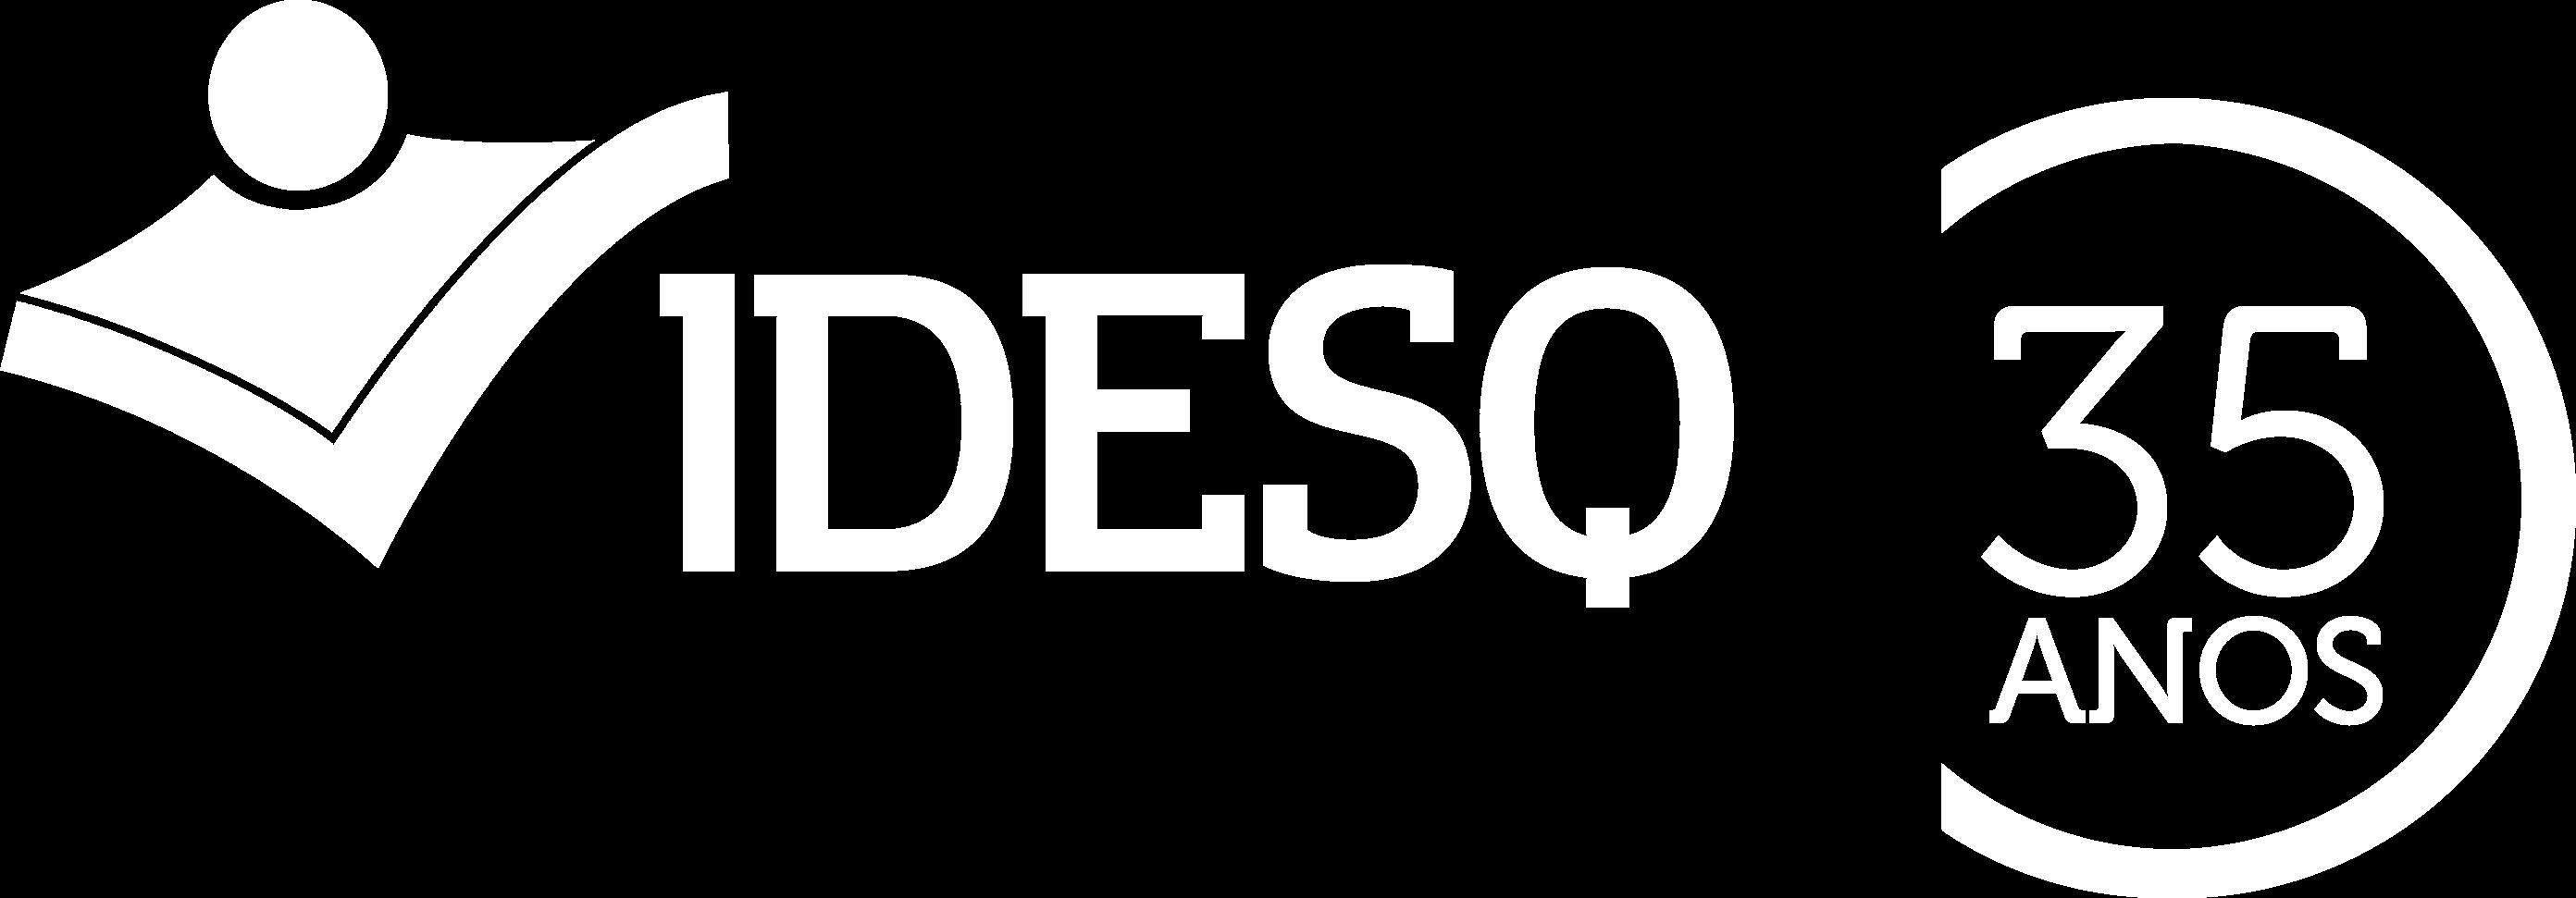 LOGO-IDESQ-PNG